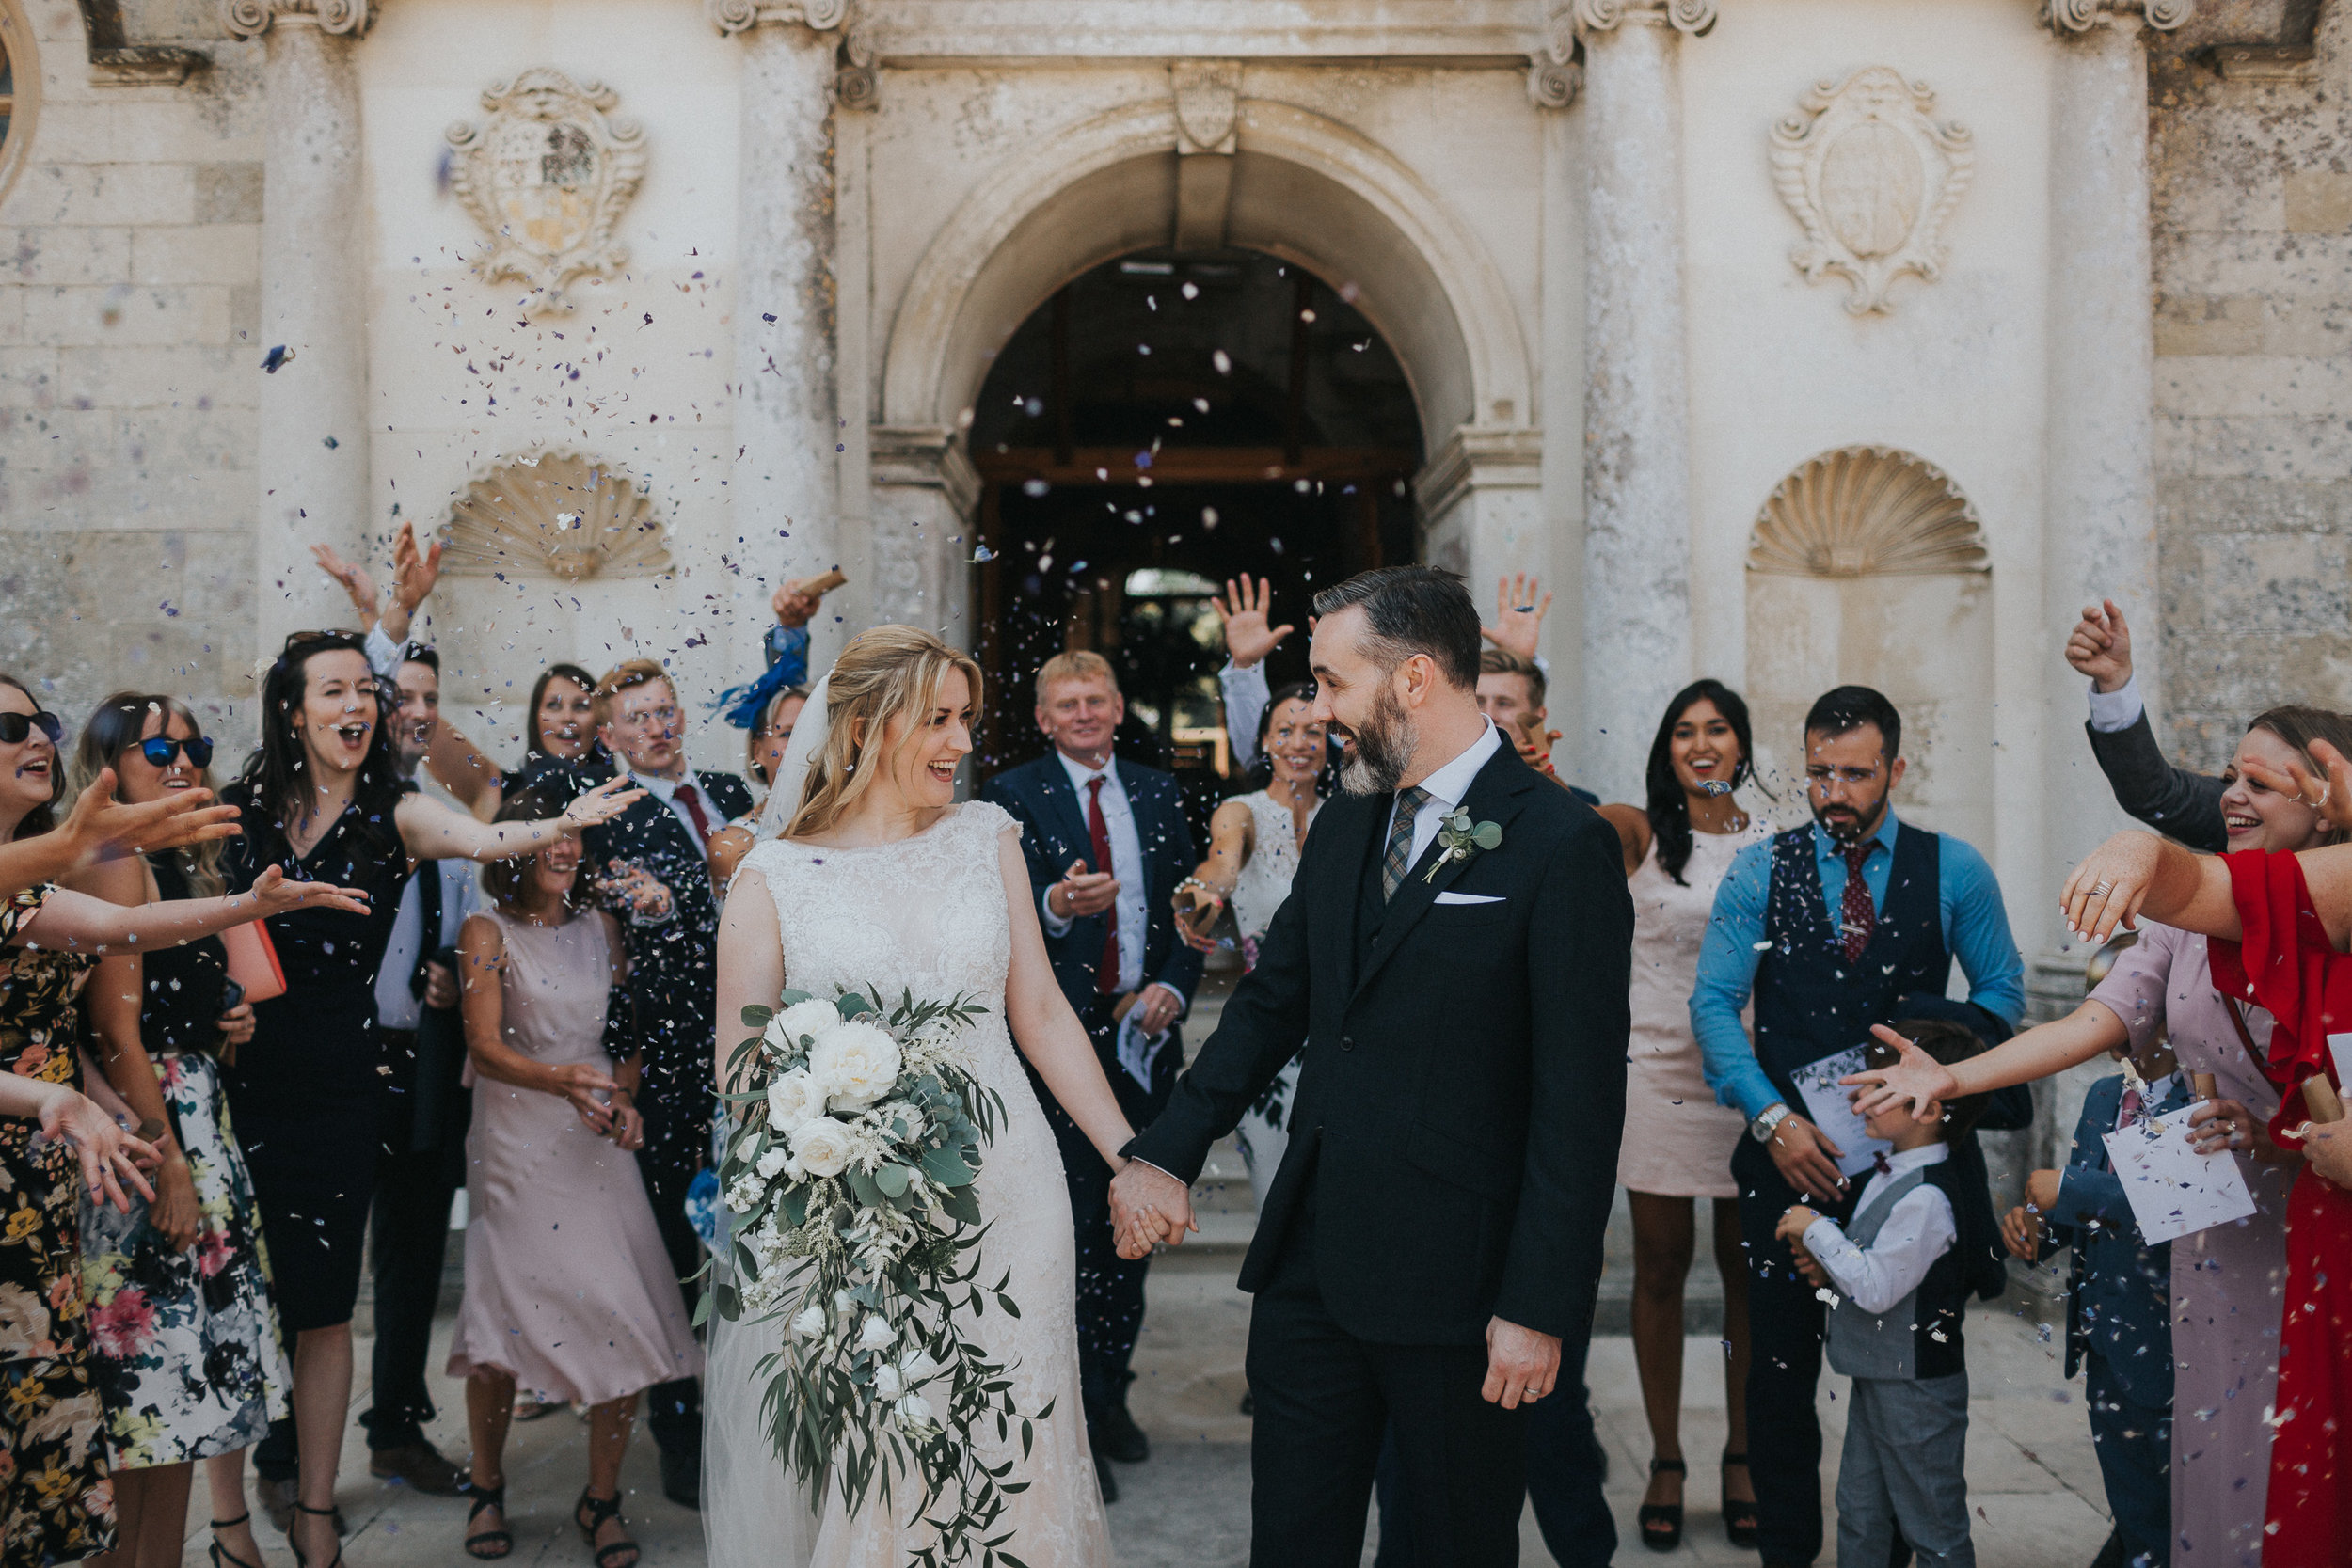 Lulworth Castle Wedding Photos028.jpg